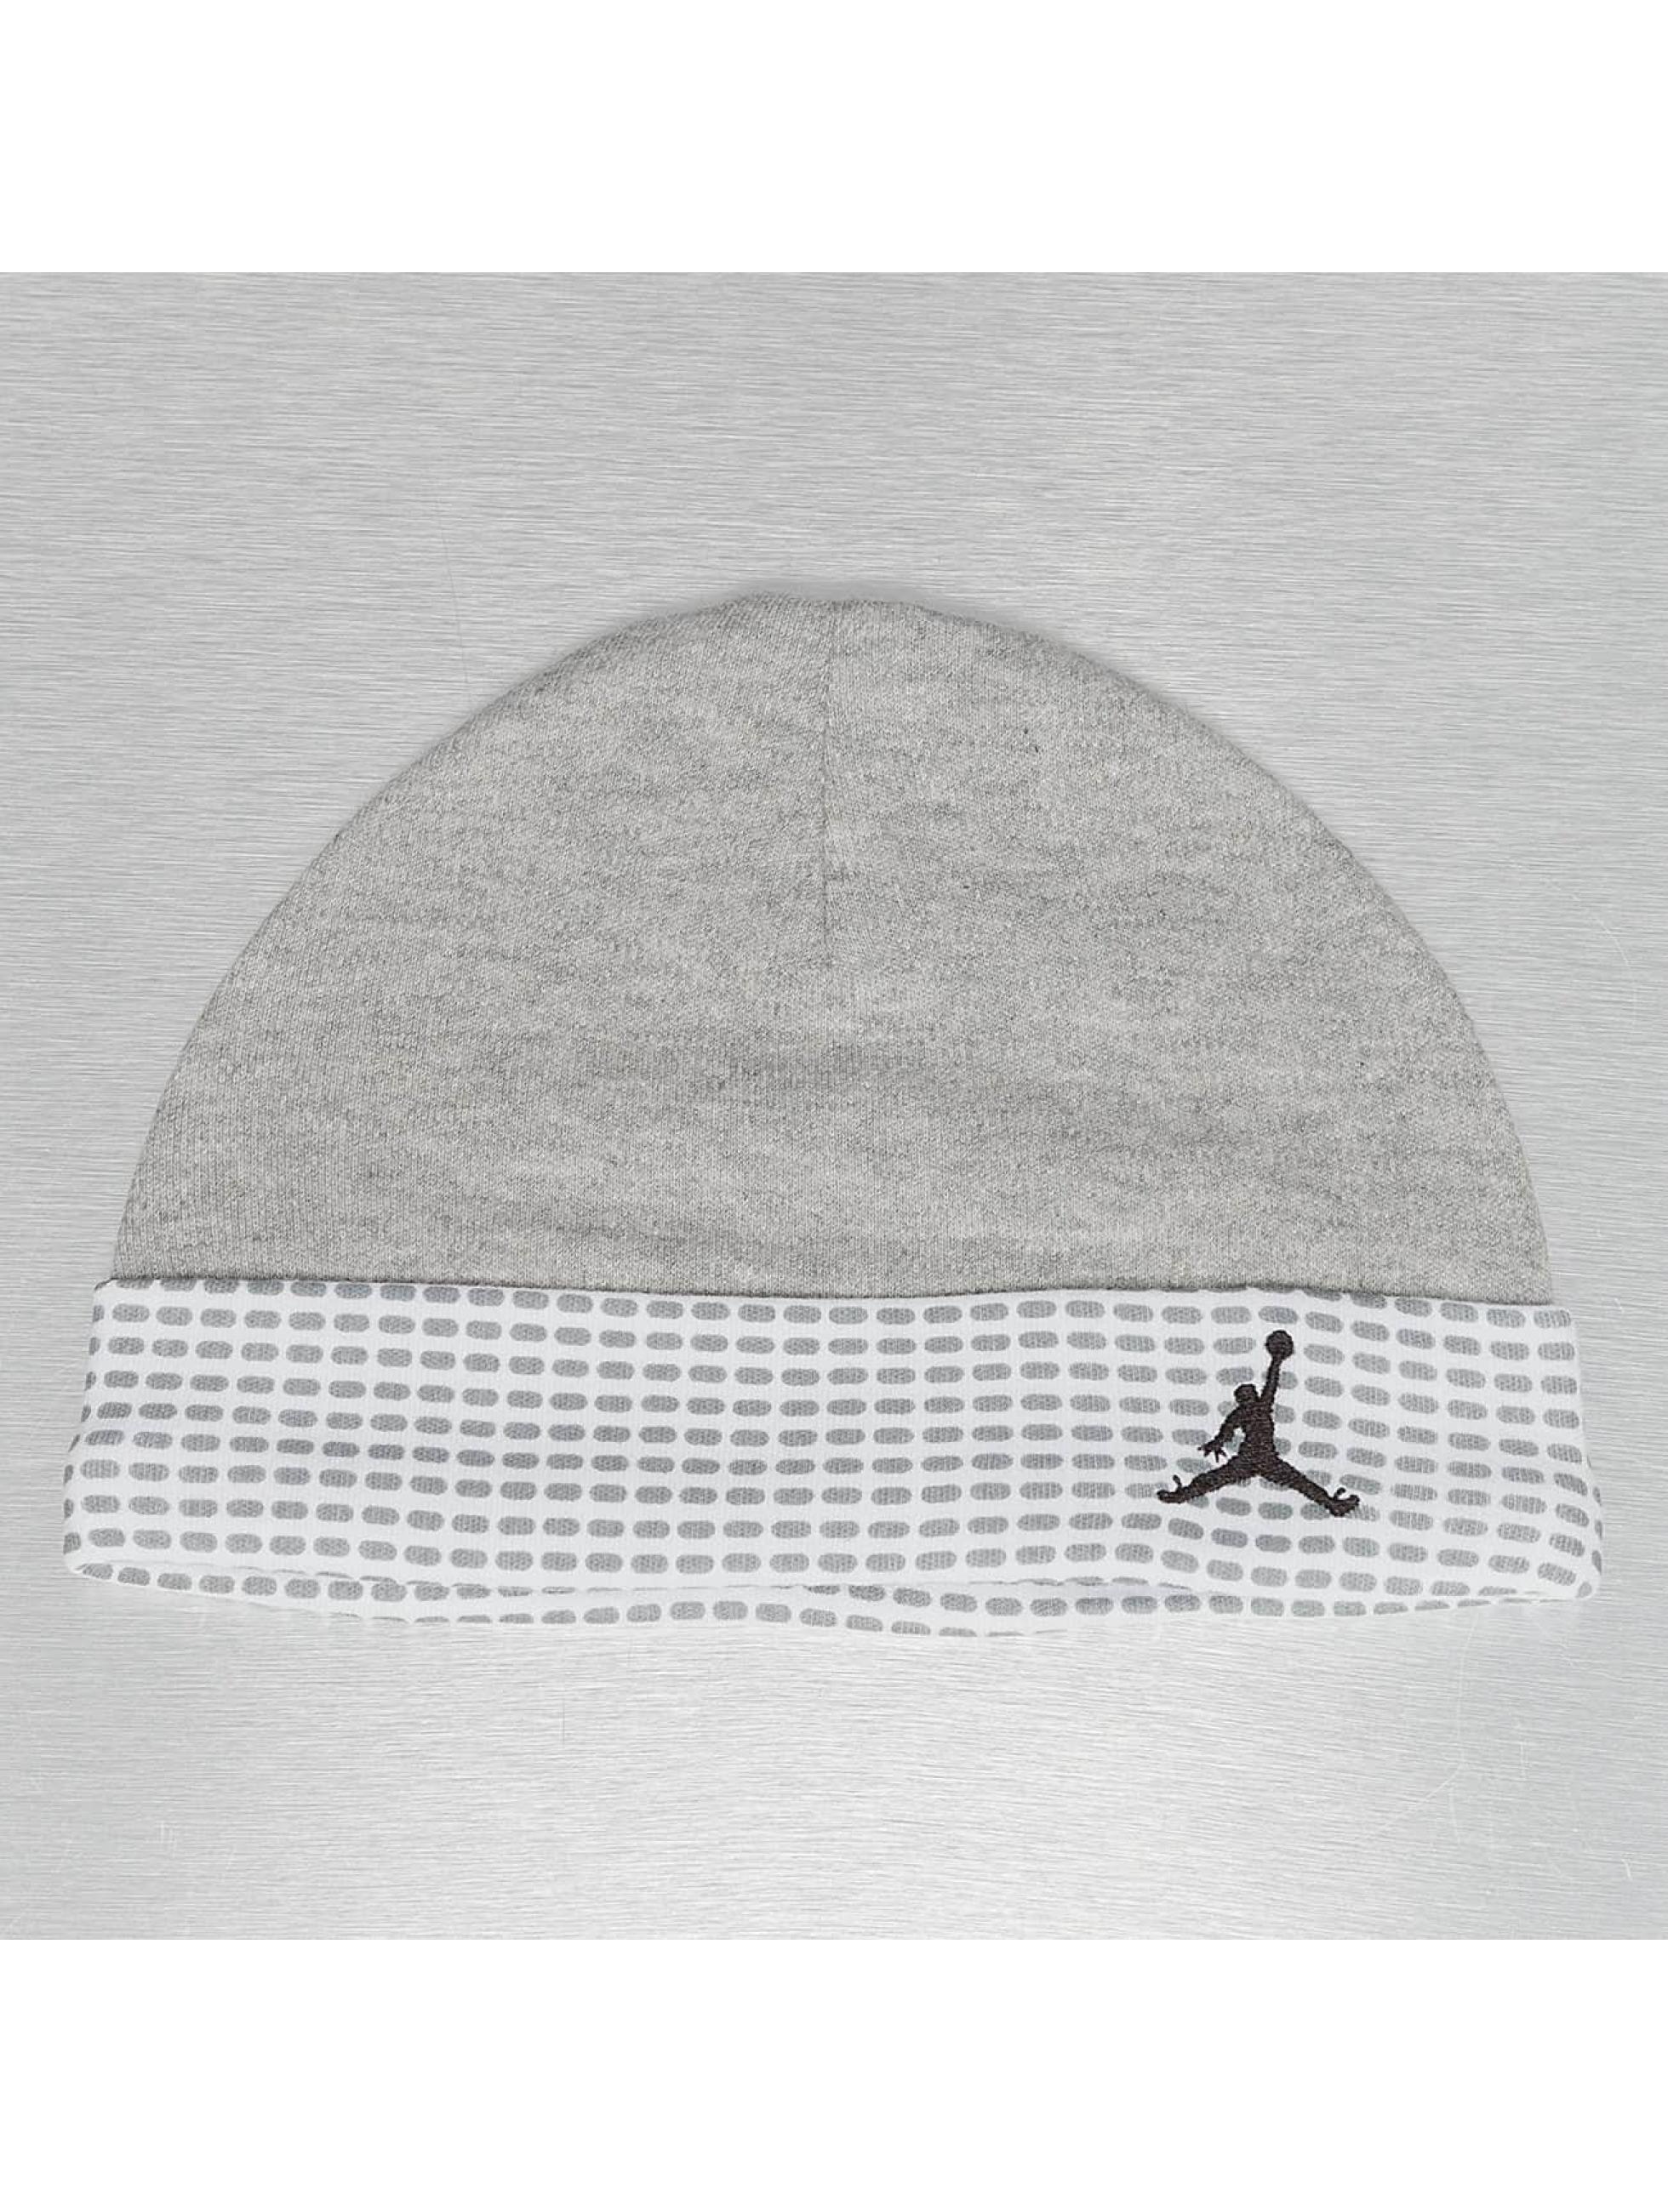 Jordan Other AJ 5 Mesh gray